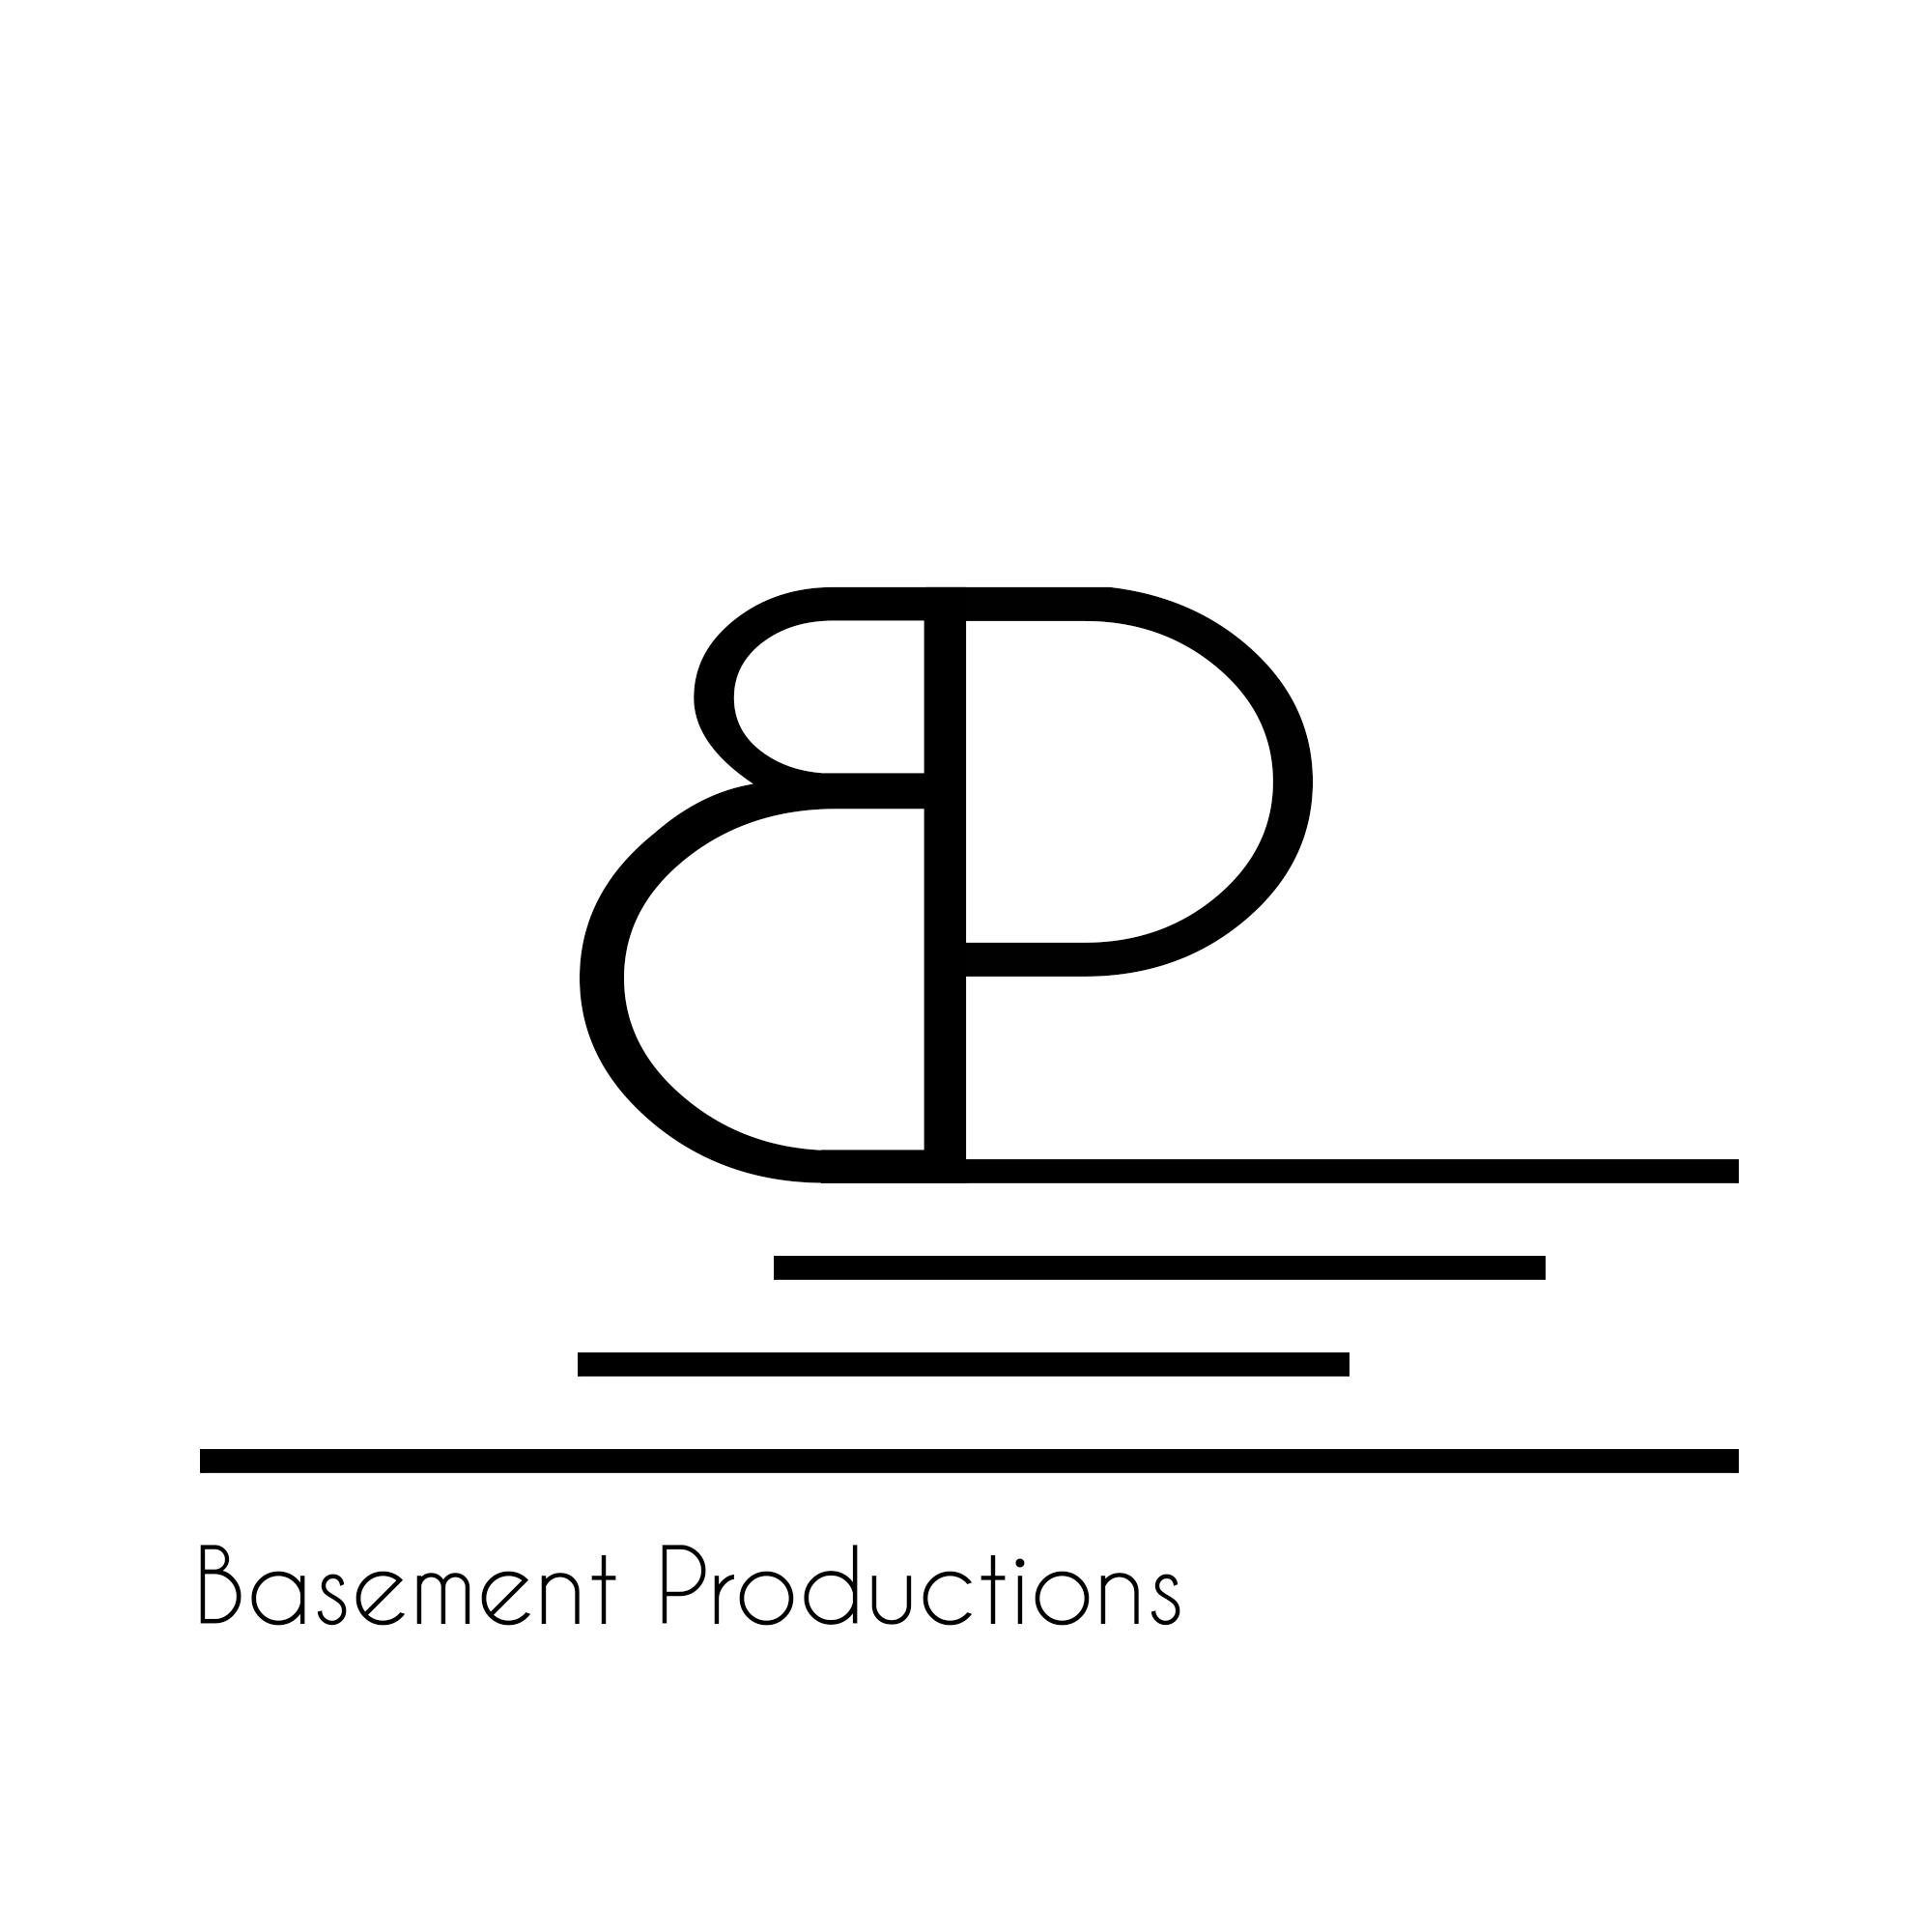 Basement Productions